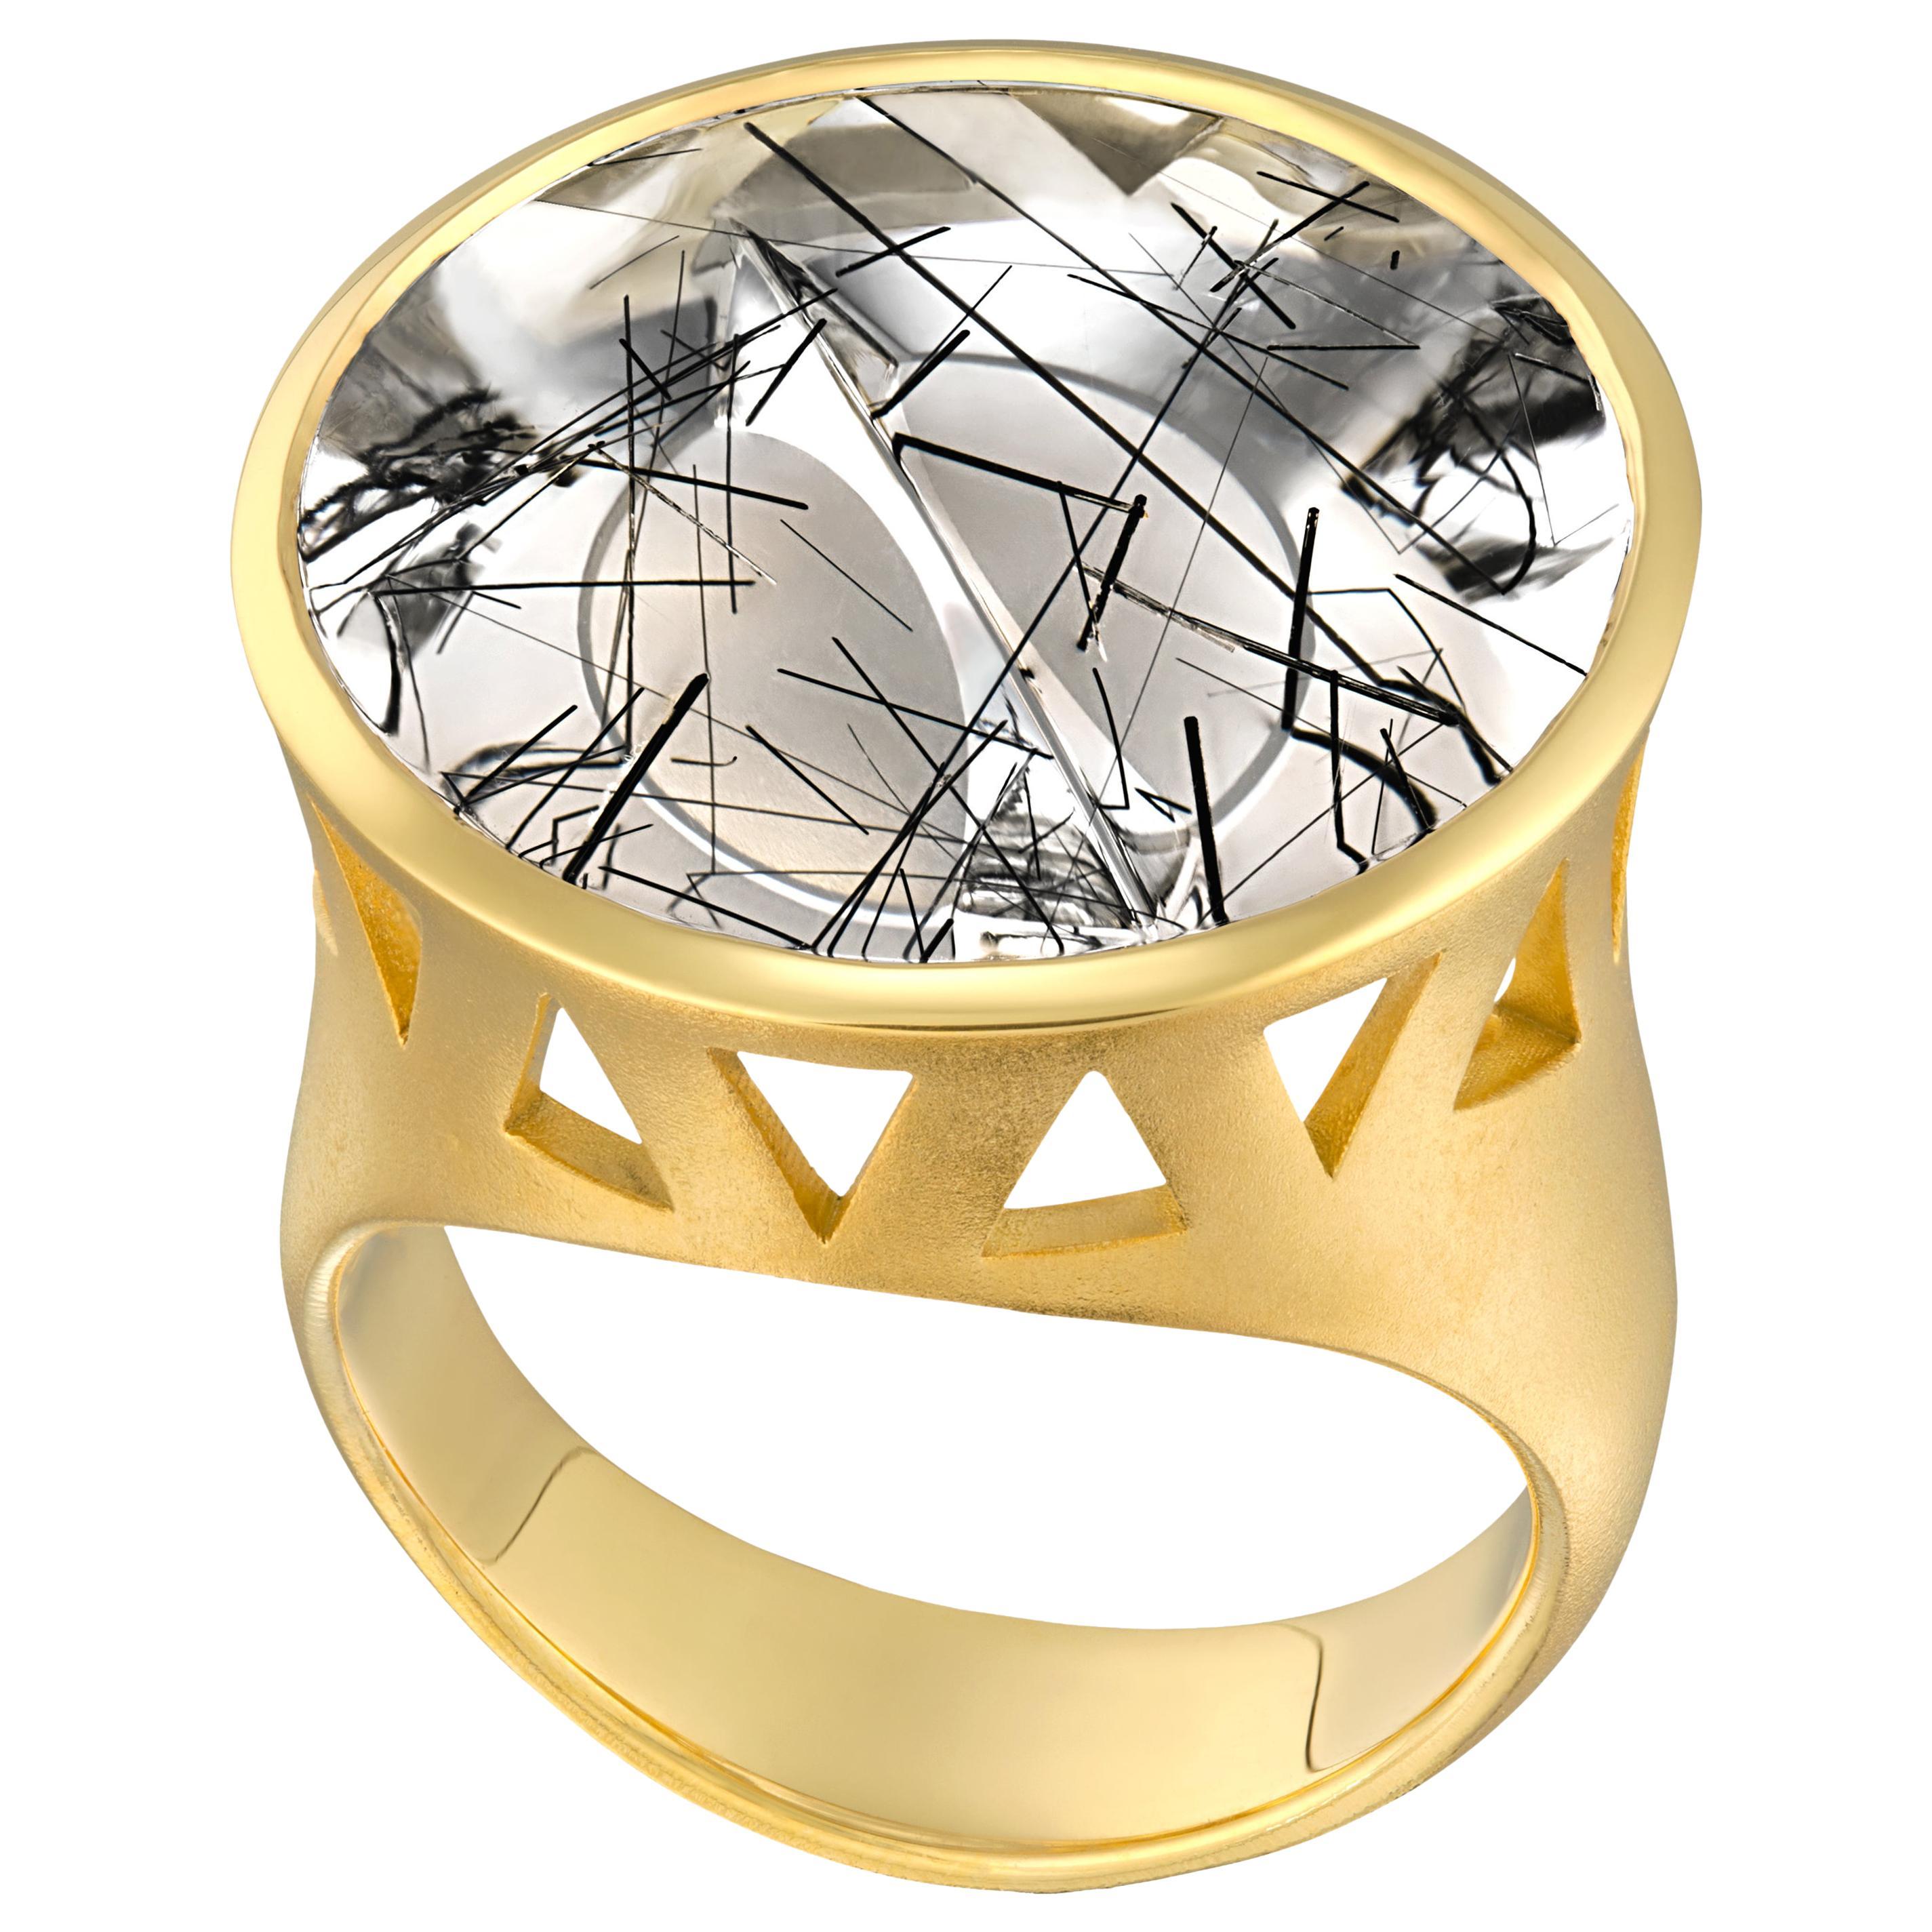 e40a9dae5 Vaid Roma Three Dimensional Golden Rutilated Quartz Onyx Gold Ring at  1stdibs